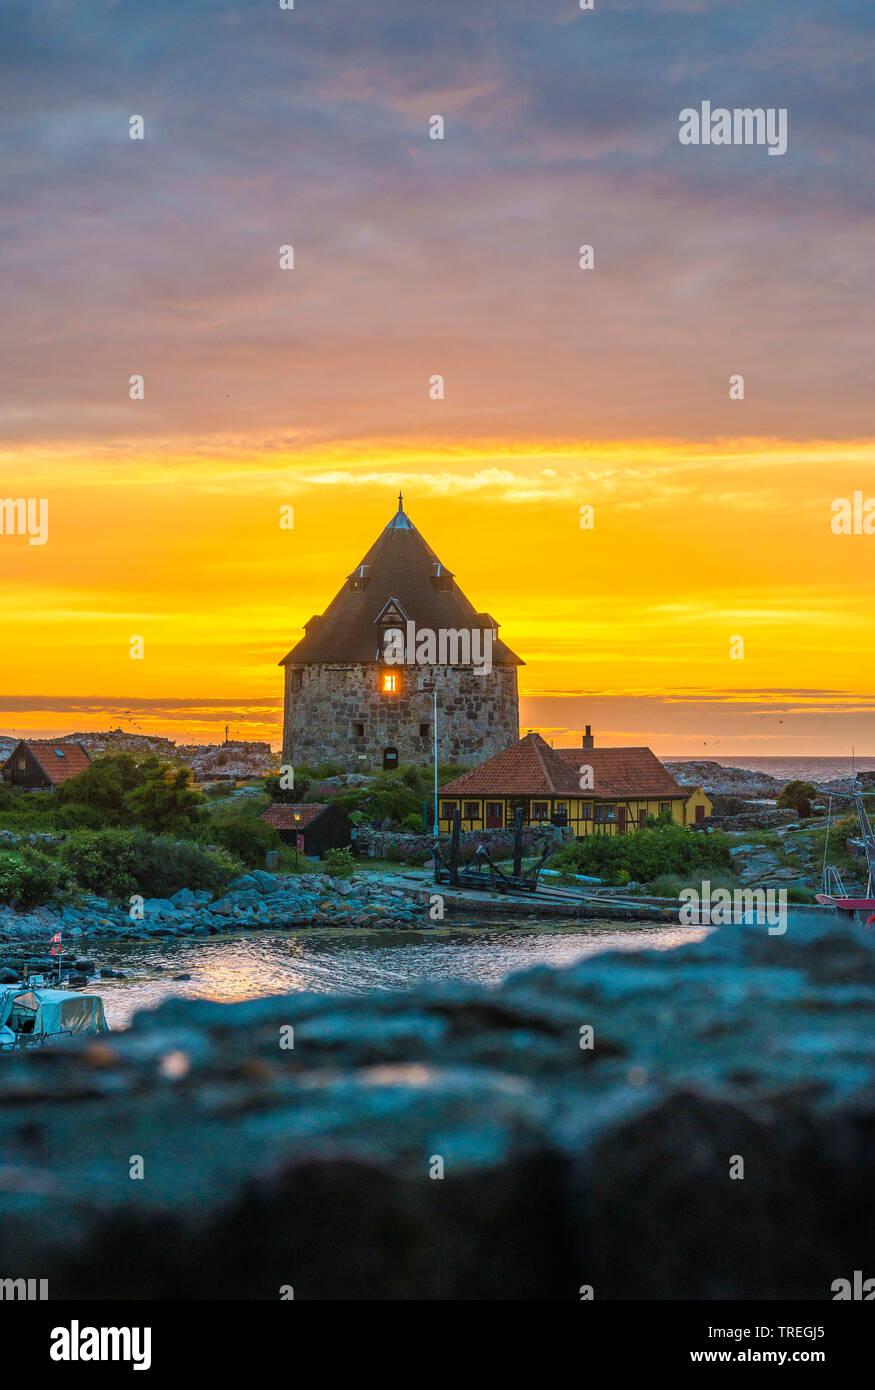 Baltic sea island Christians-Oe with bastion, Denmark, Christians-Oe Stock Photo